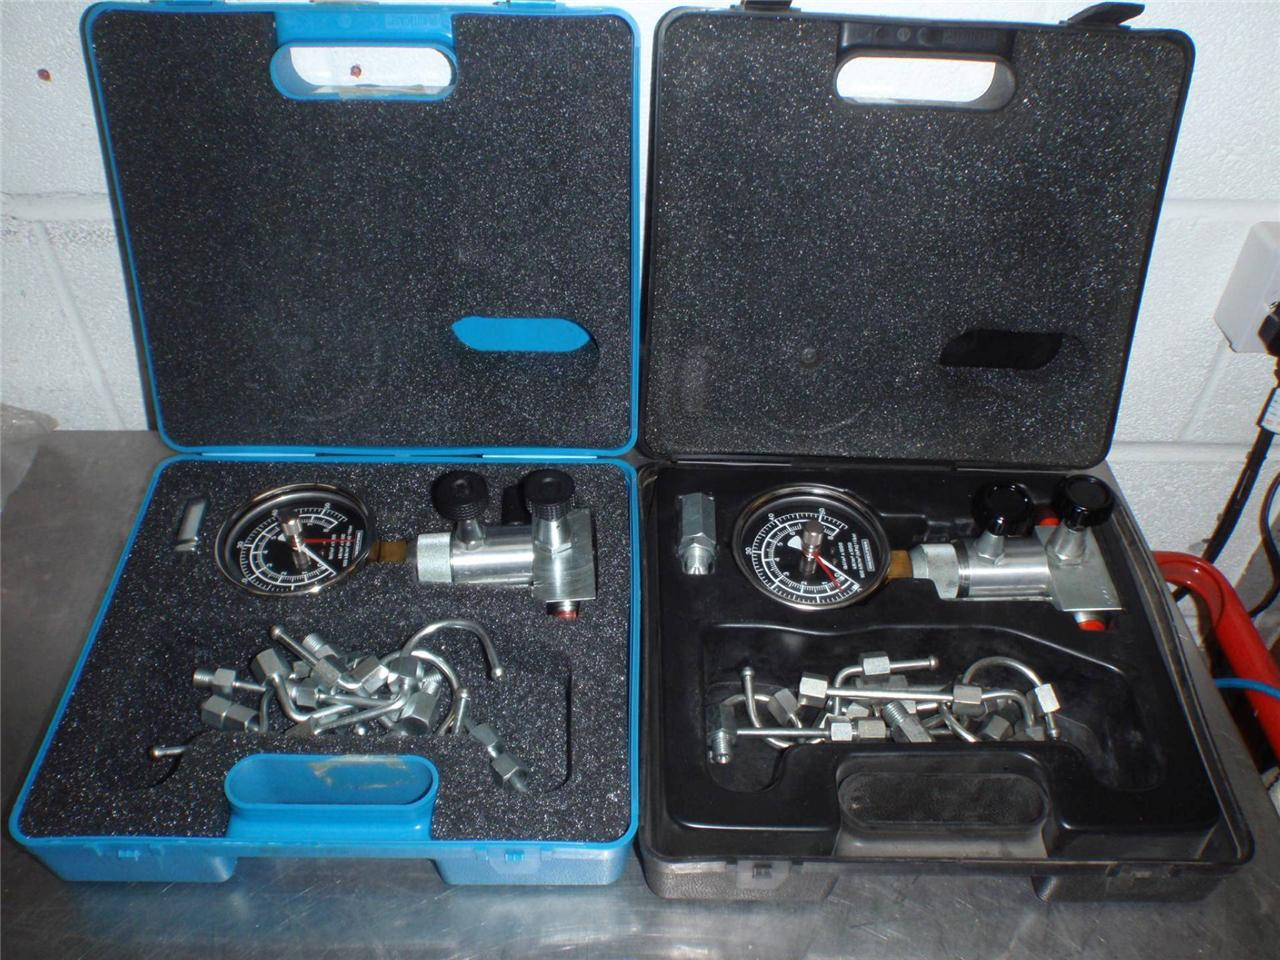 OTC-Diesel-Injector-Tester106-106a-Injectester-TI-Dieseltune-VAT-INC